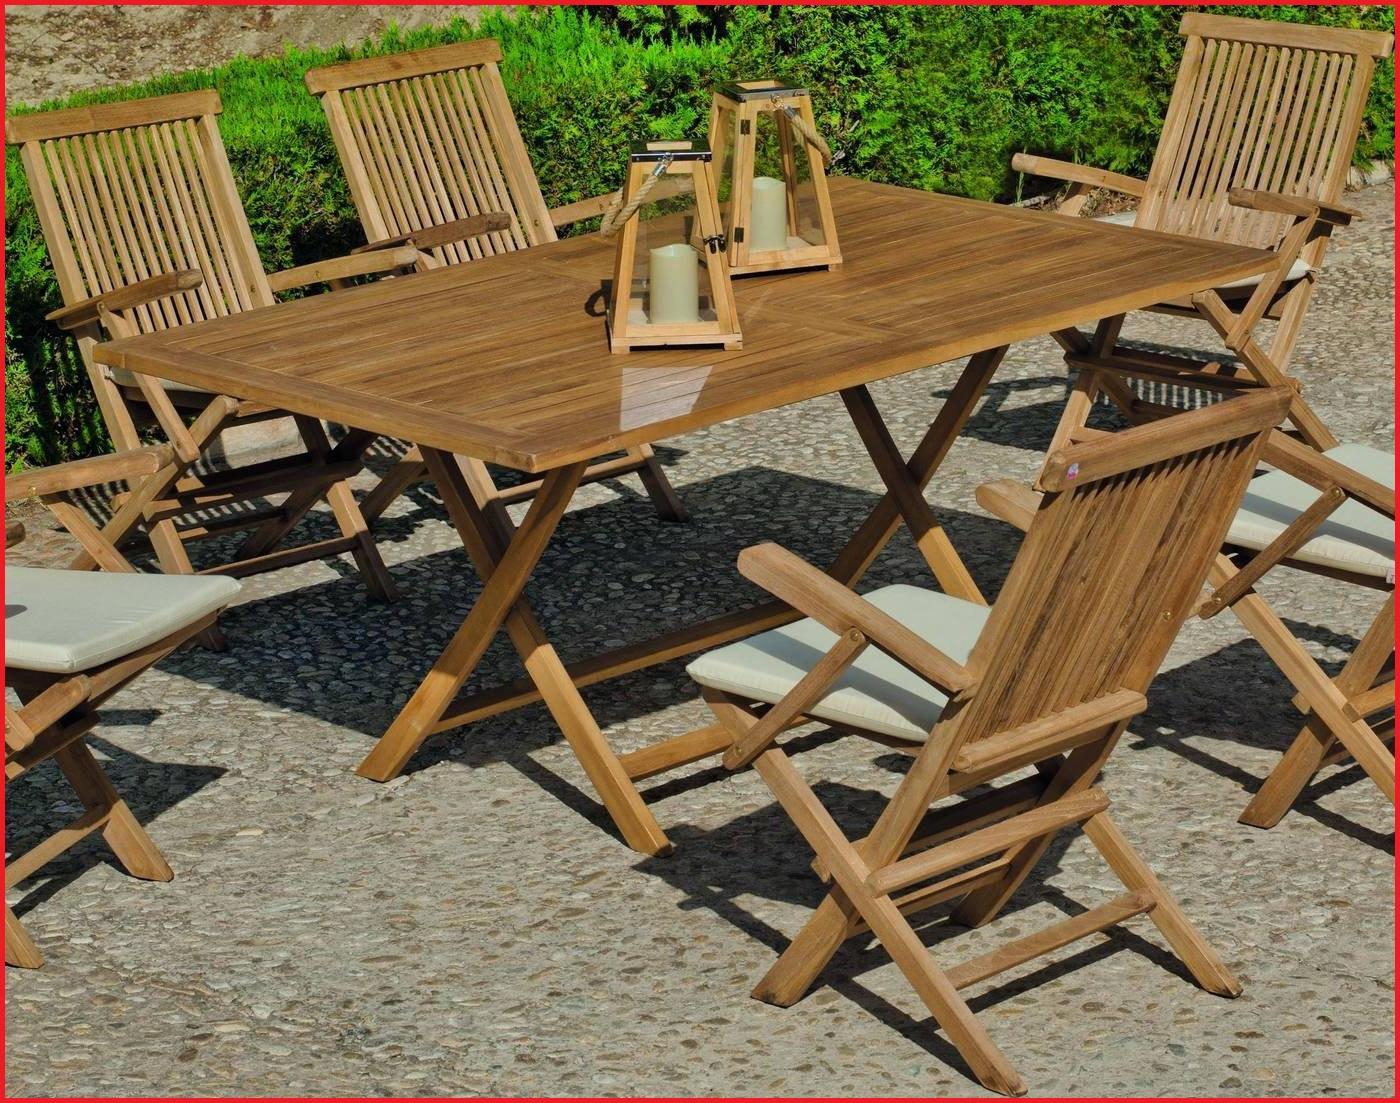 Muebles De Teka Dddy Muebles De Jardin Madera Teca Mesa De Jardà N Redonda Madera Teca